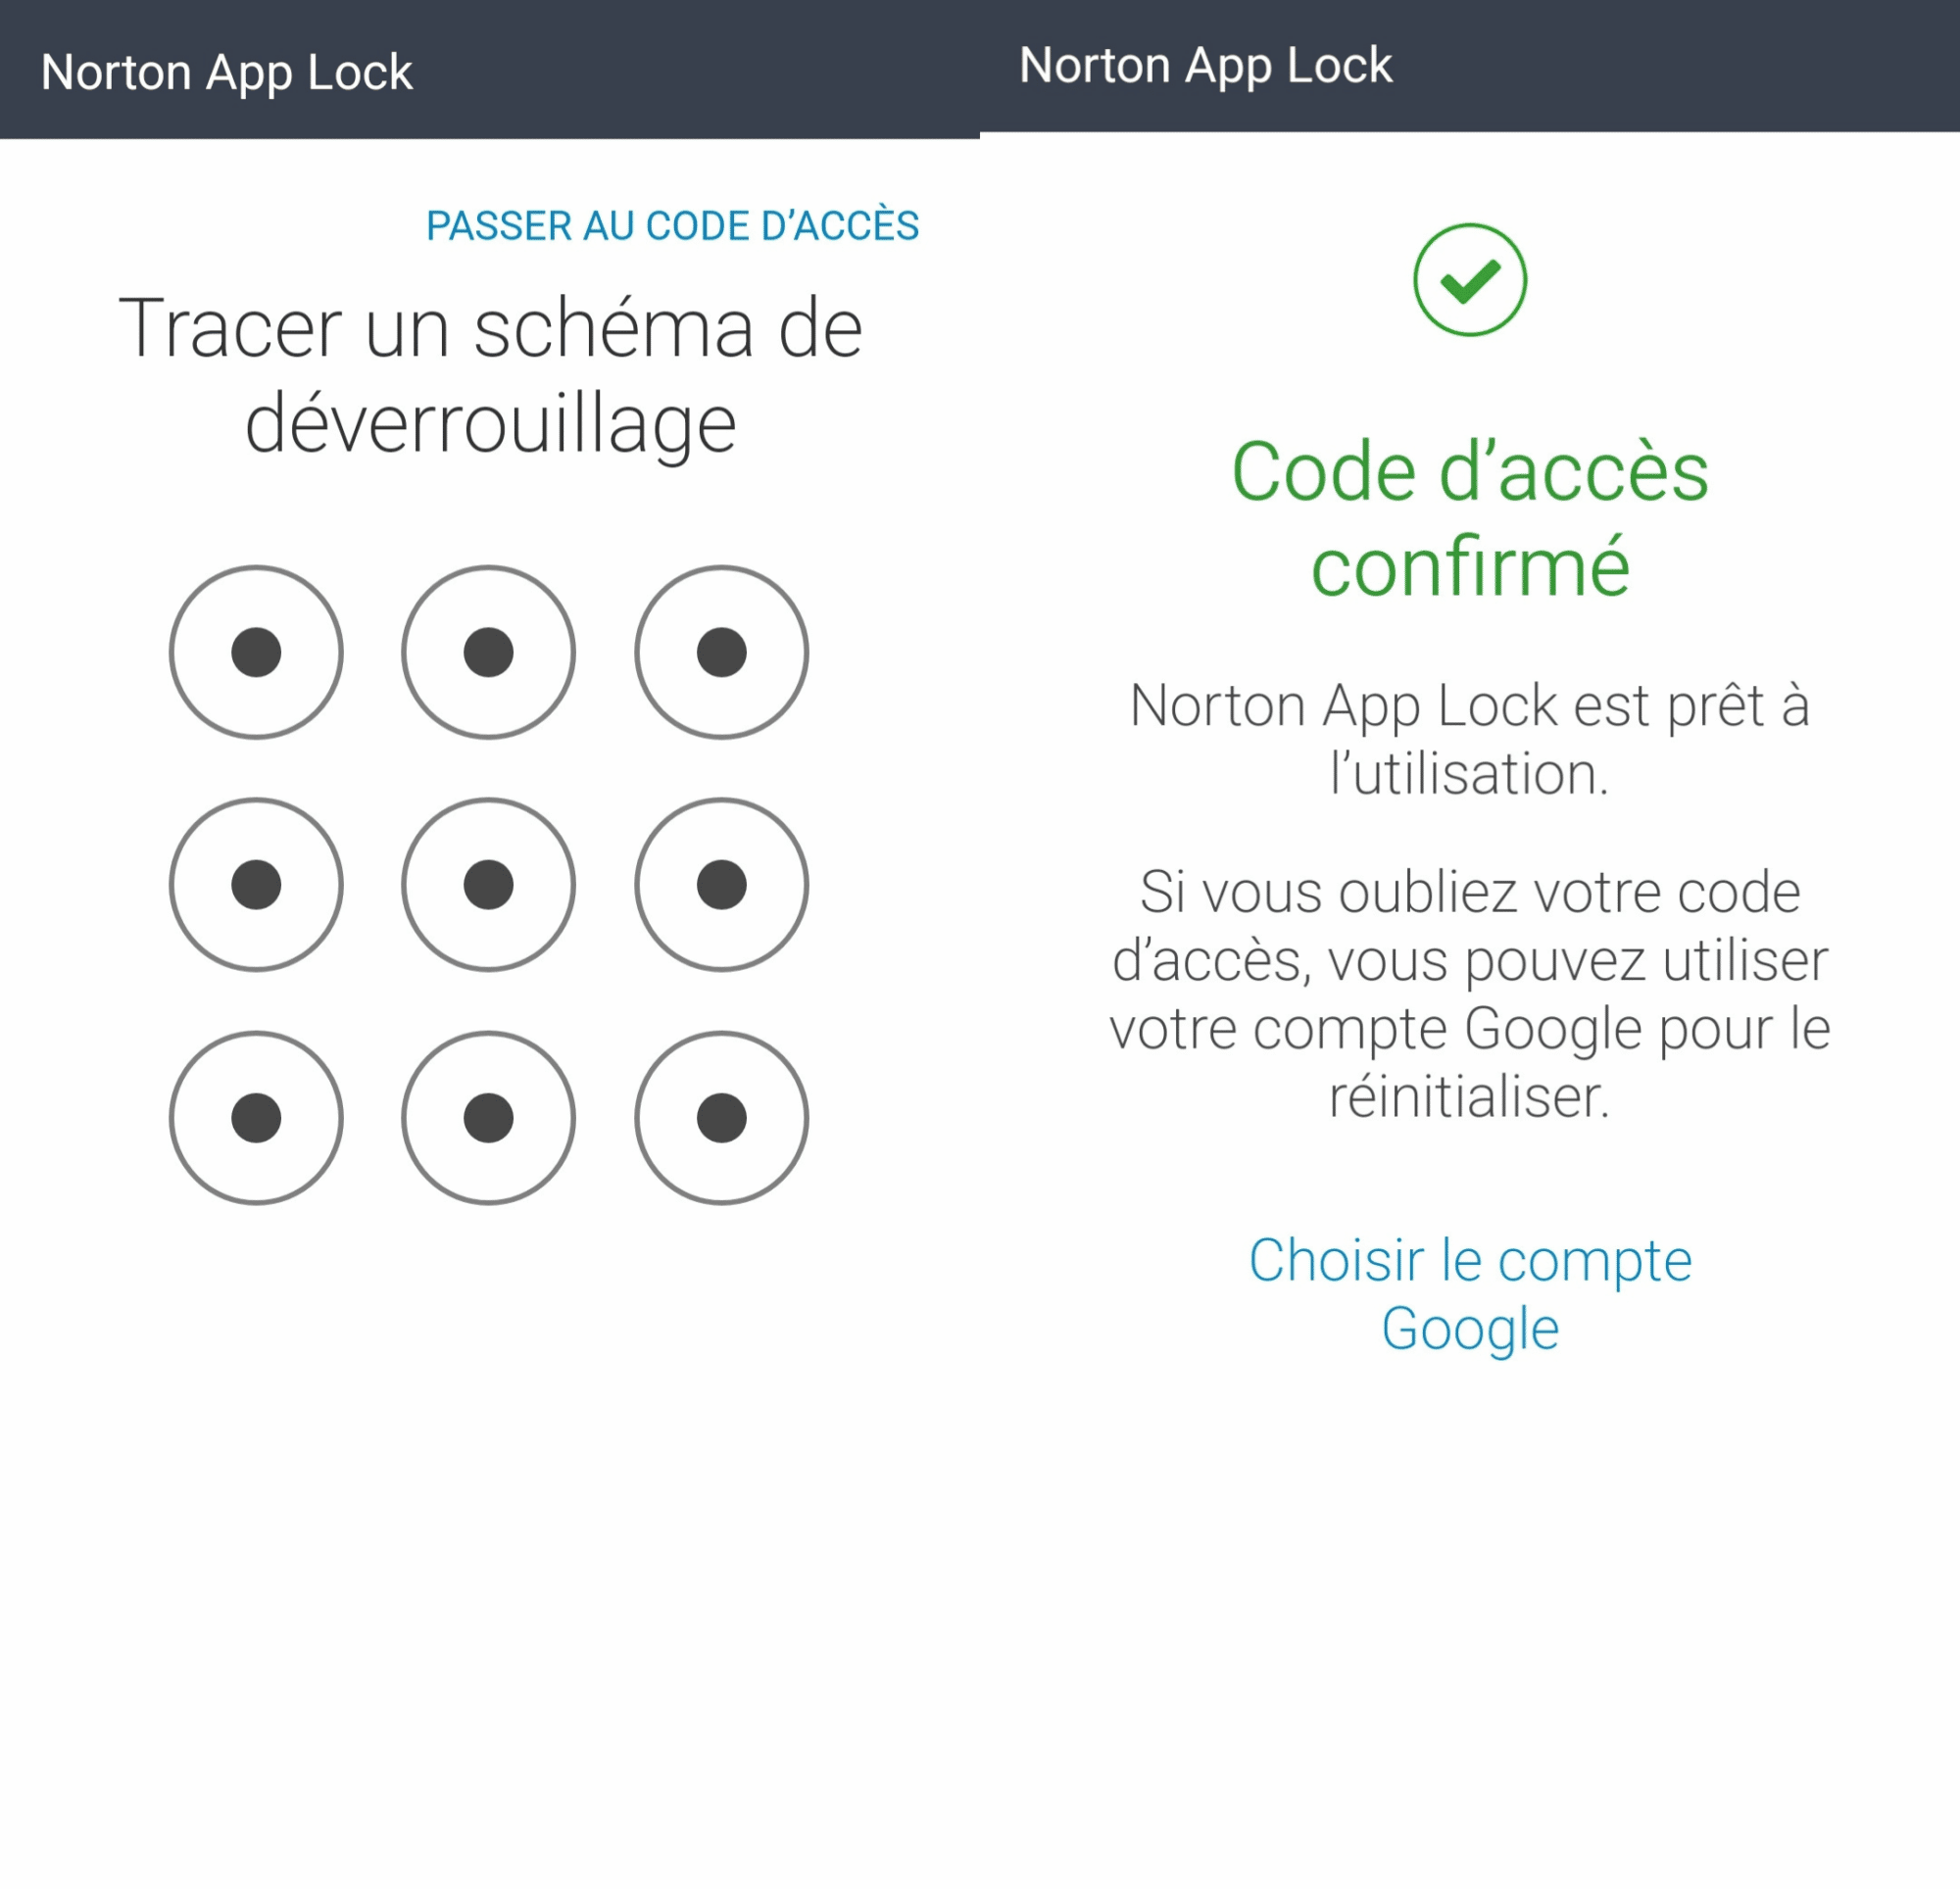 mode-verouillage-application-norton-app-lock